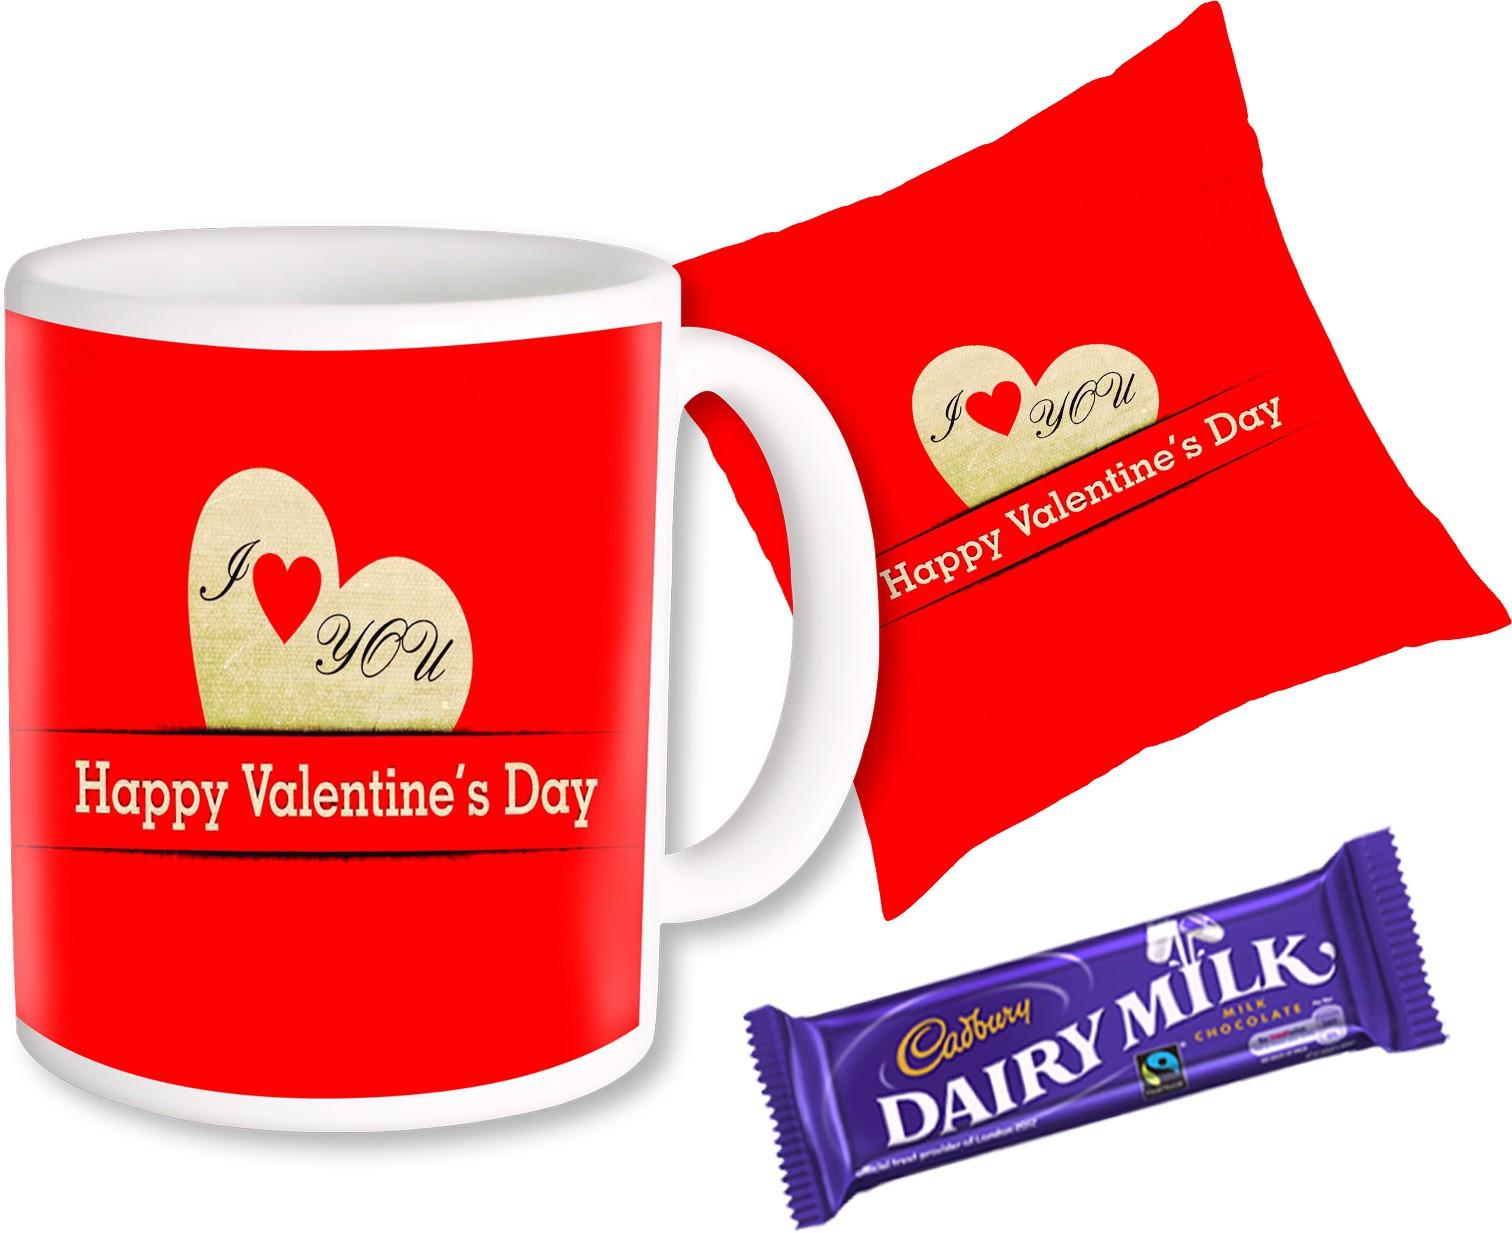 PhotogiftsIndia happy valentine day 007 Ceramic Gift Box